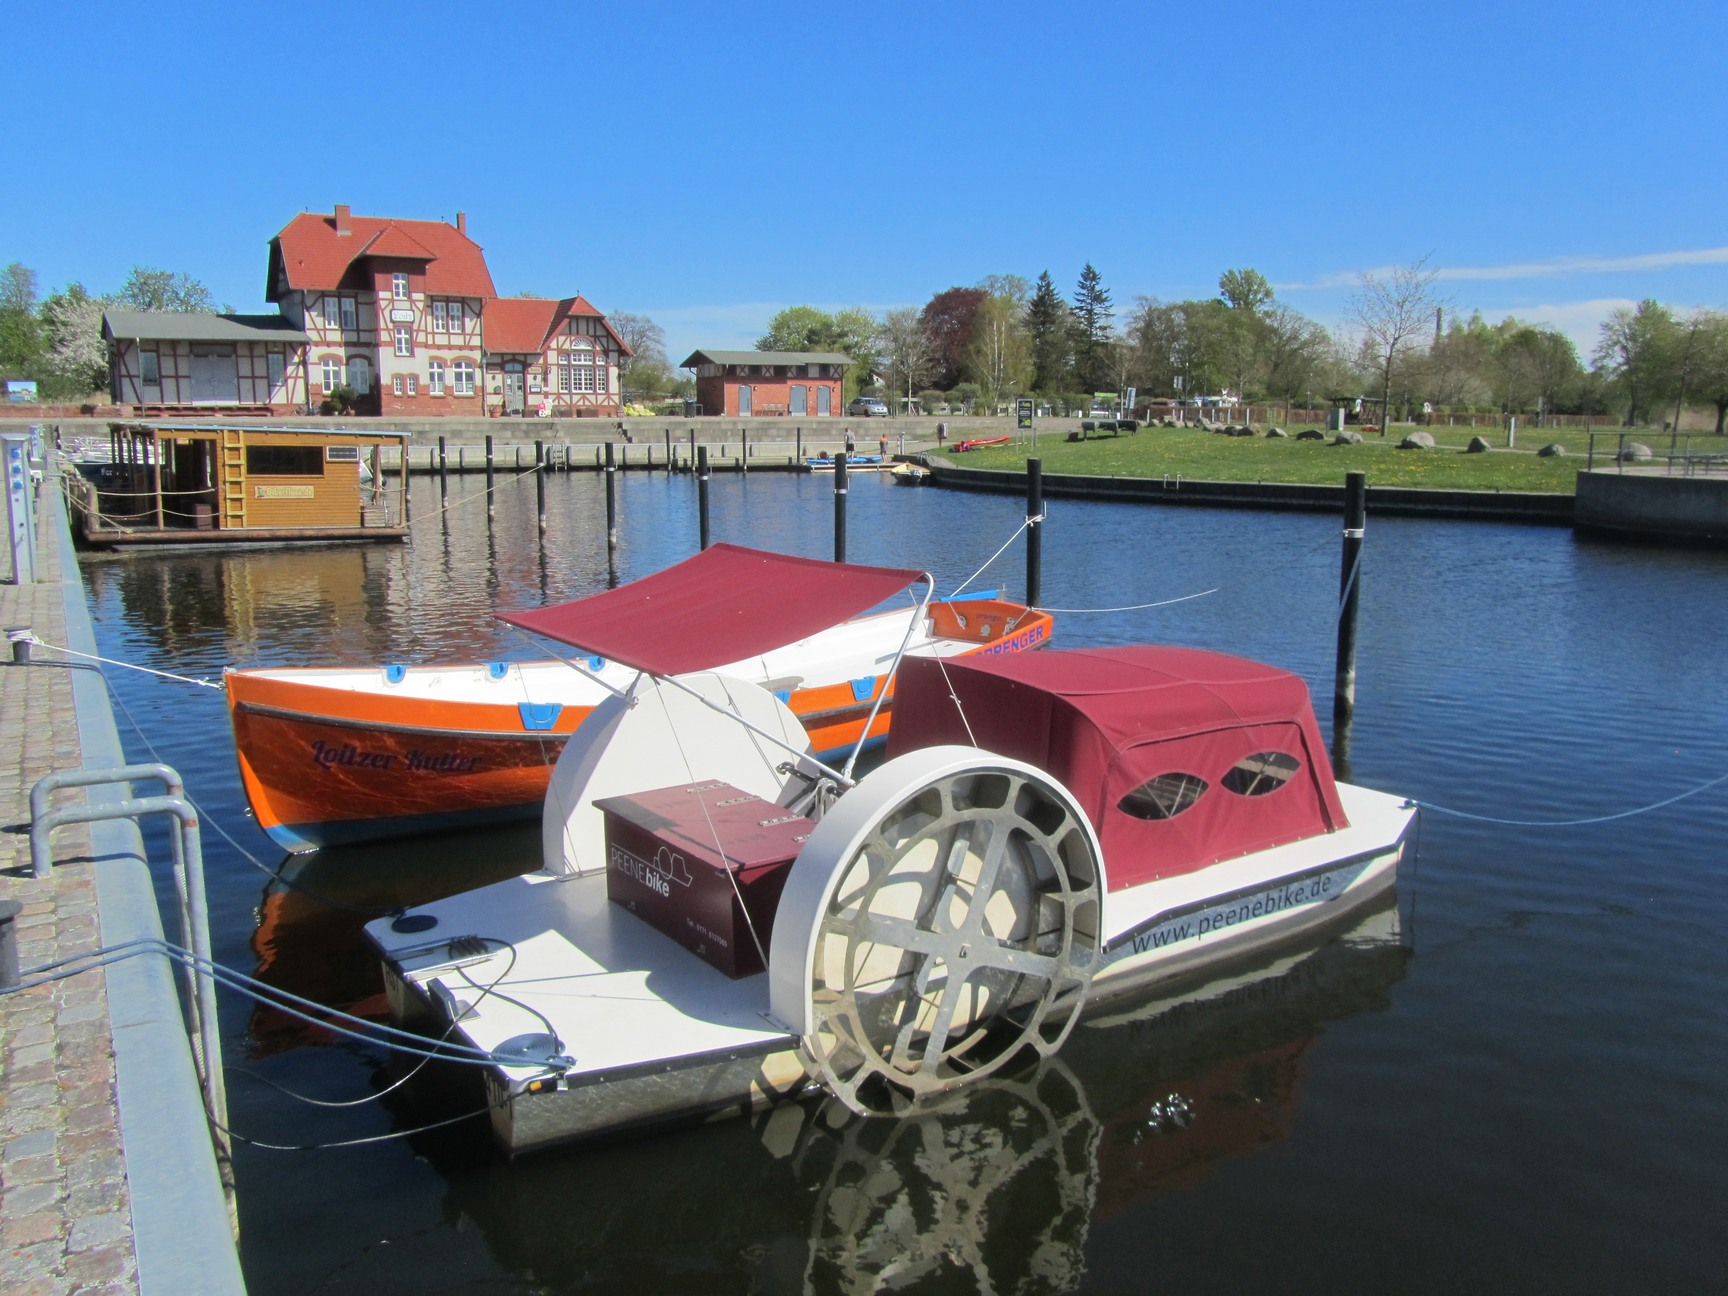 Tretboot Loitz